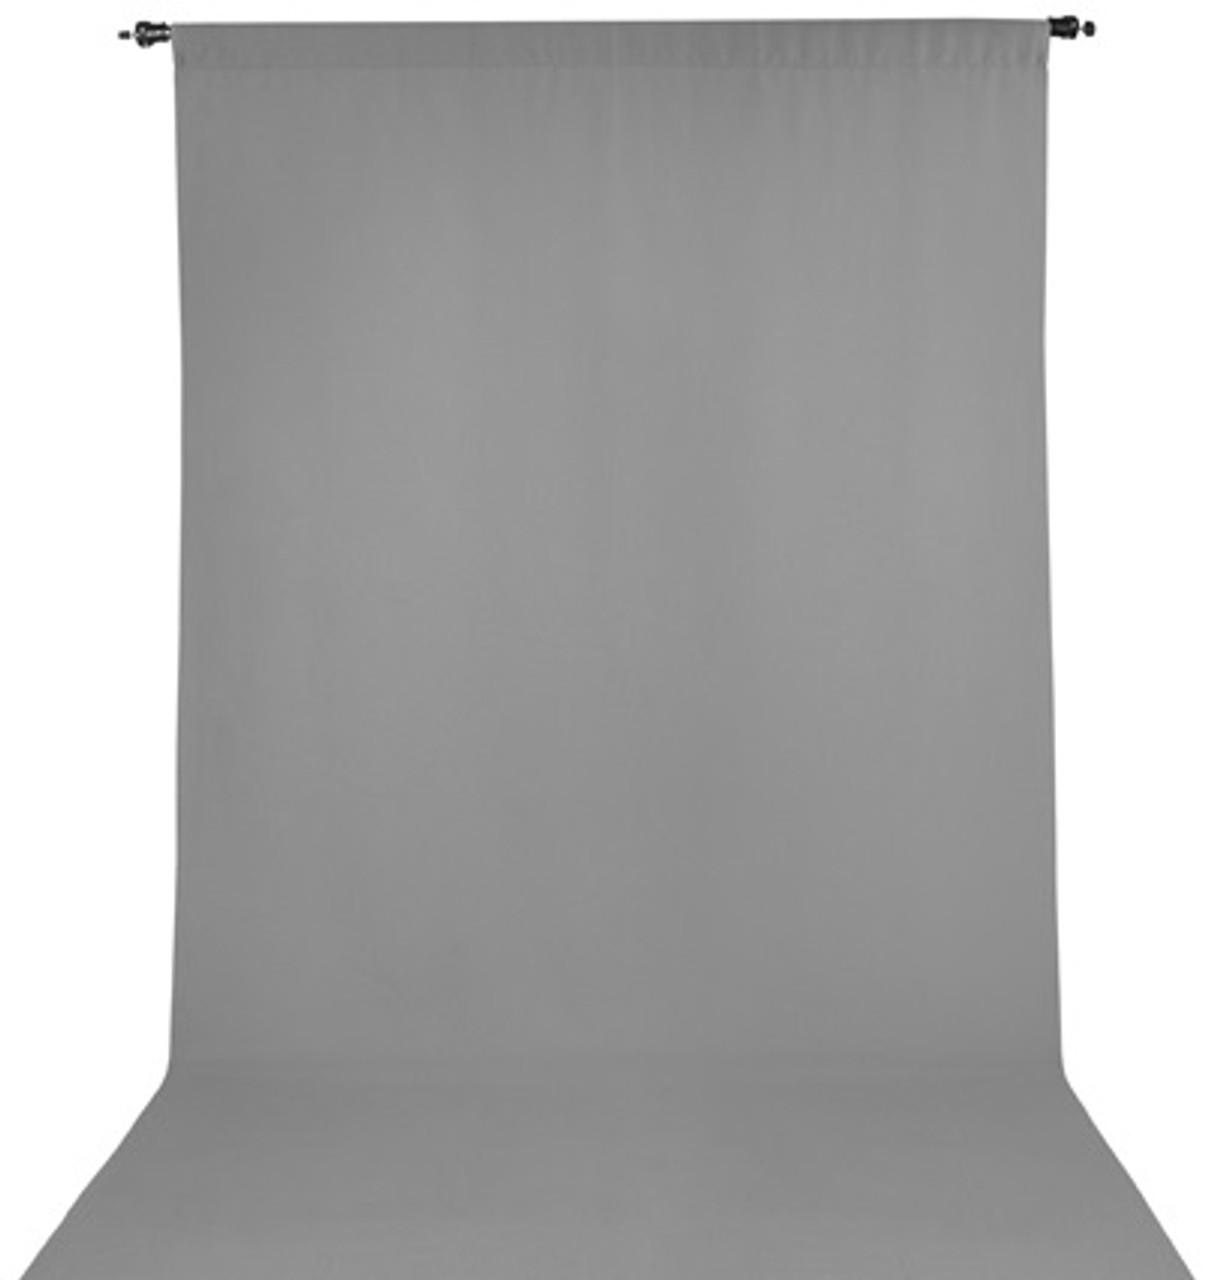 ProMaster Wrinkle Resistant Backdrop 10'x20' - Grey #2988